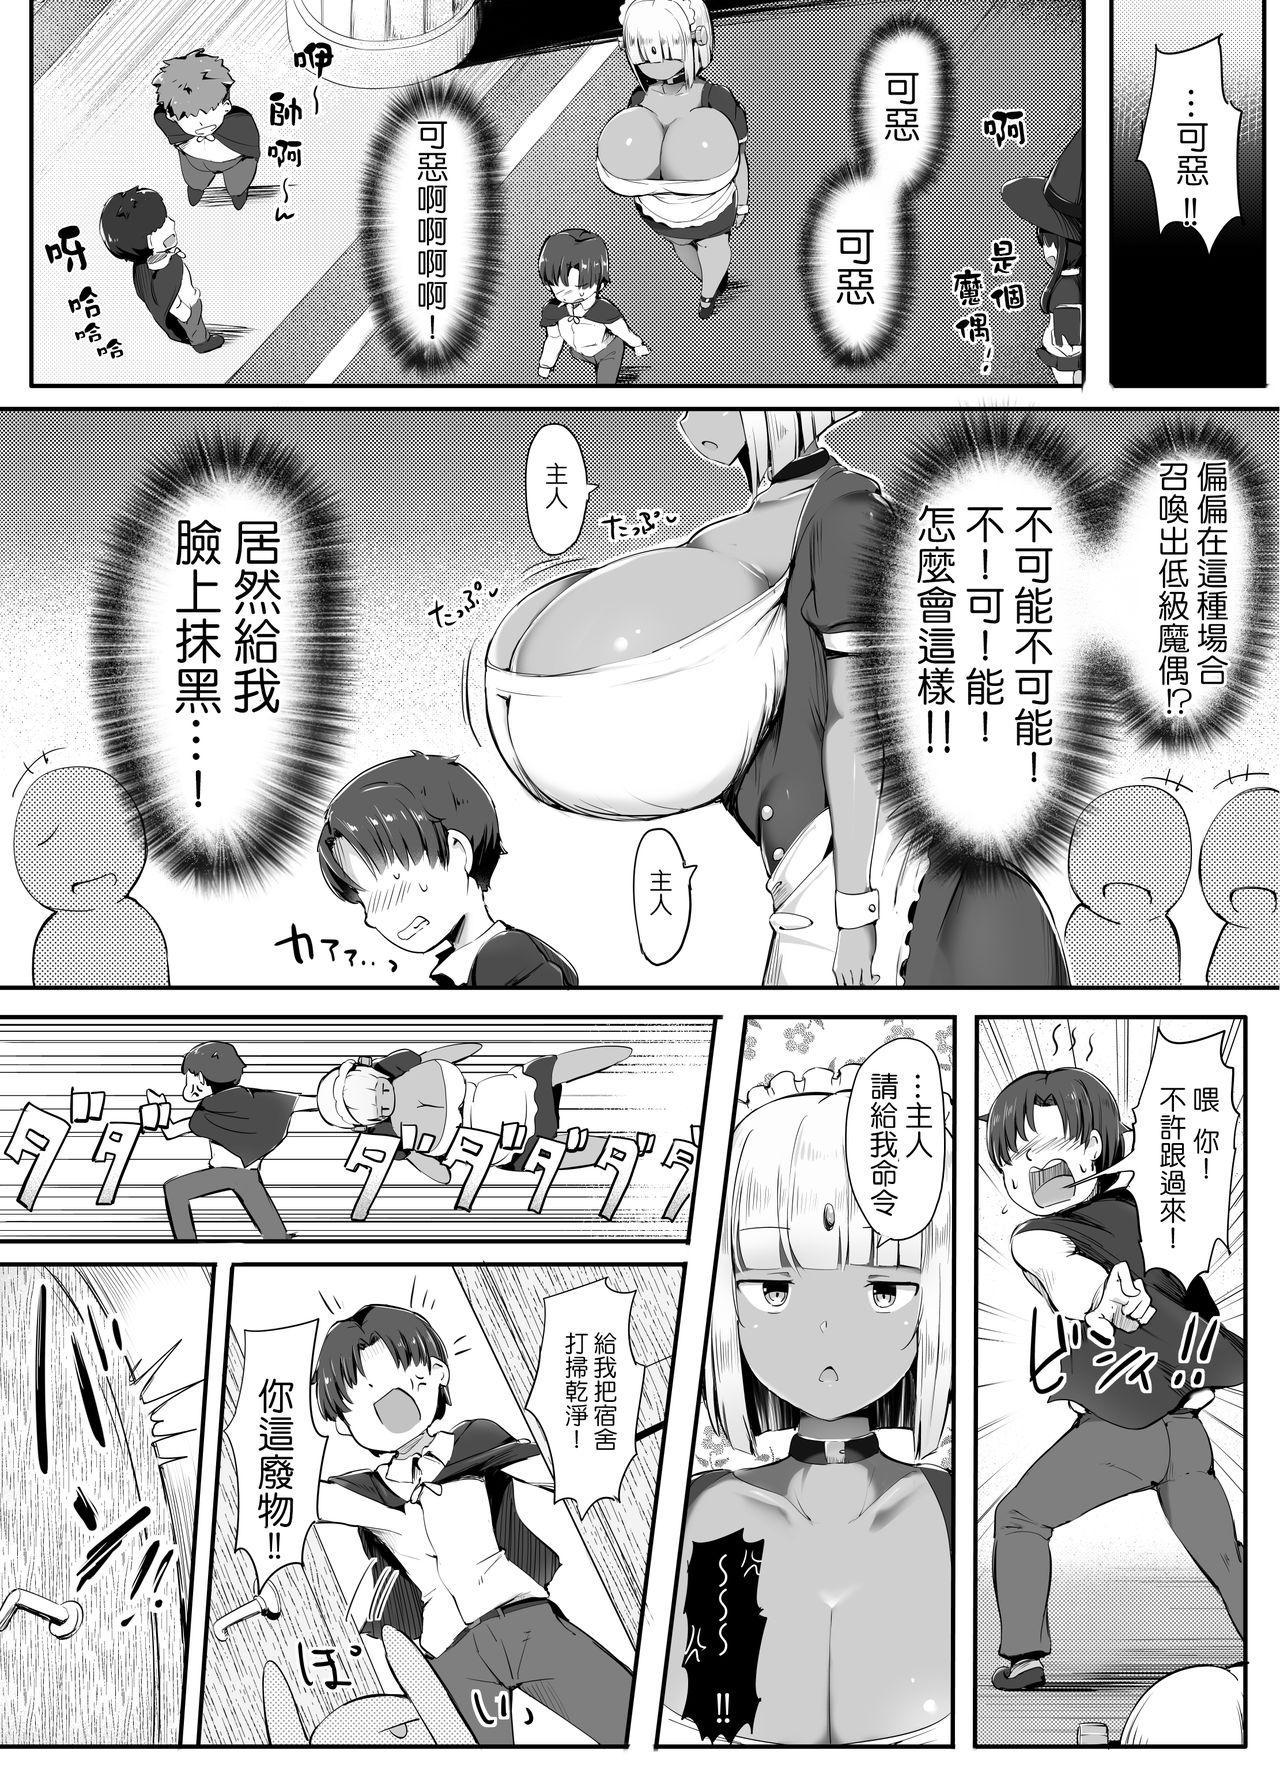 Ponkotsu Golem no Kuse ni Namaiki da. 6